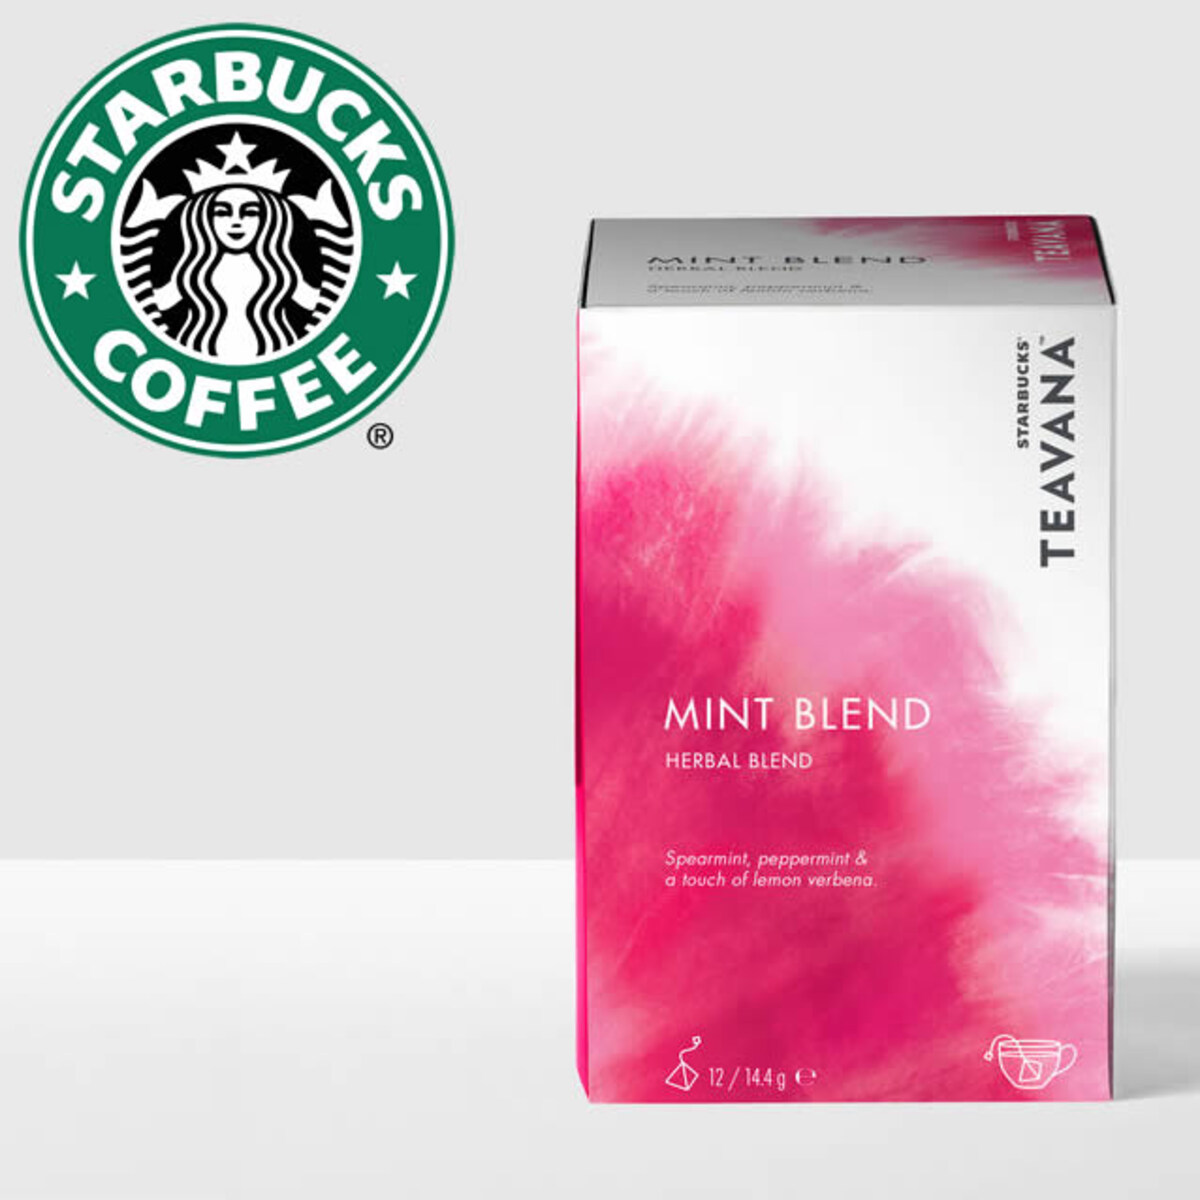 Starbucks Teavana Mint Blend билков чай на сашета 12бр